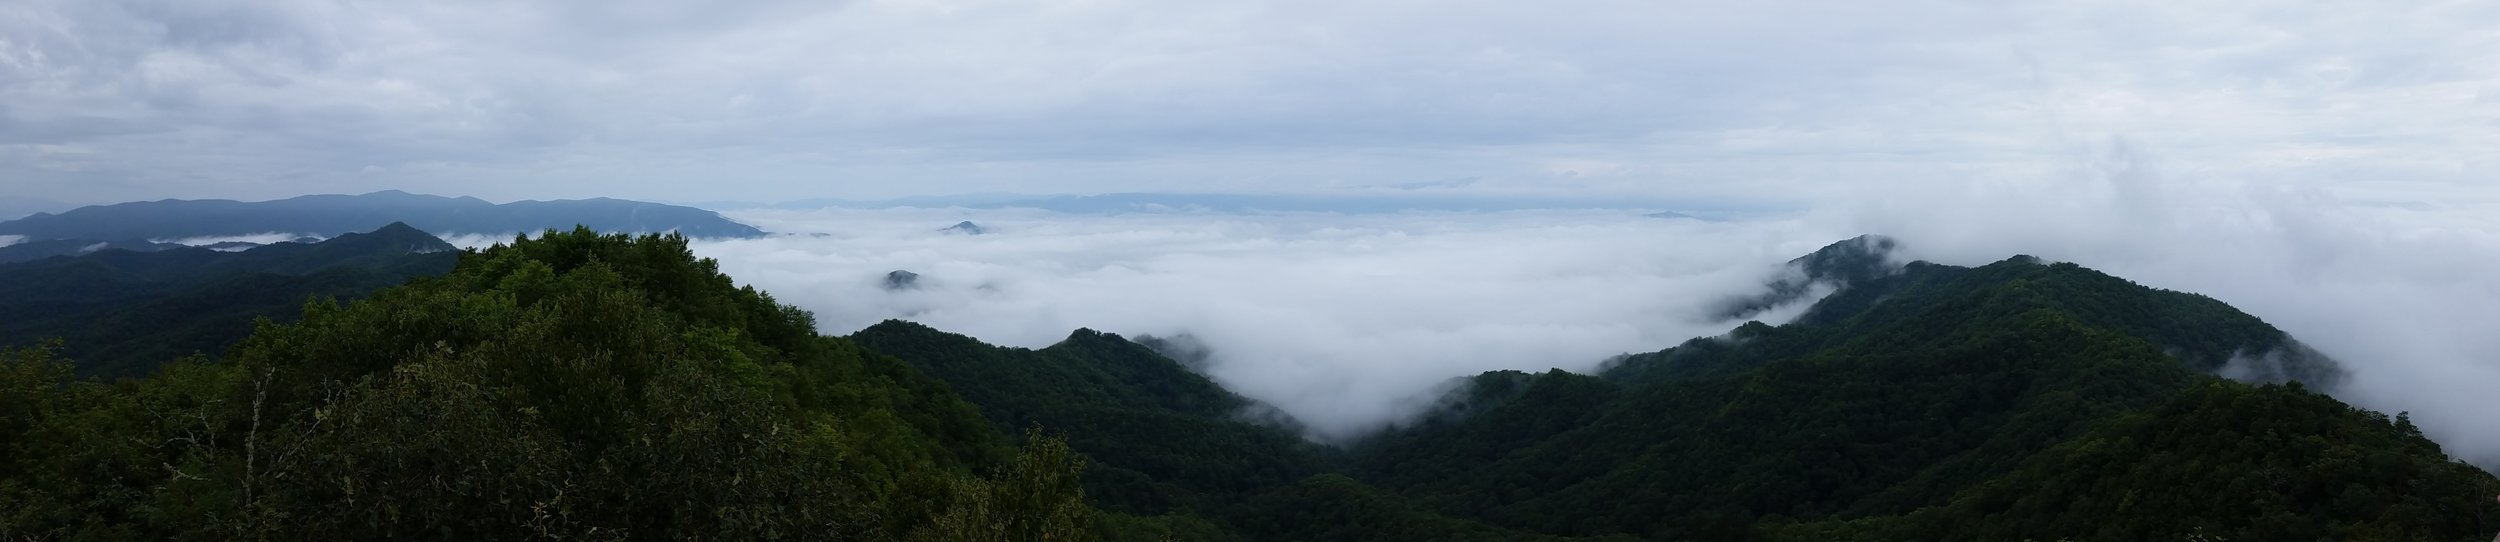 noc mountains.jpg